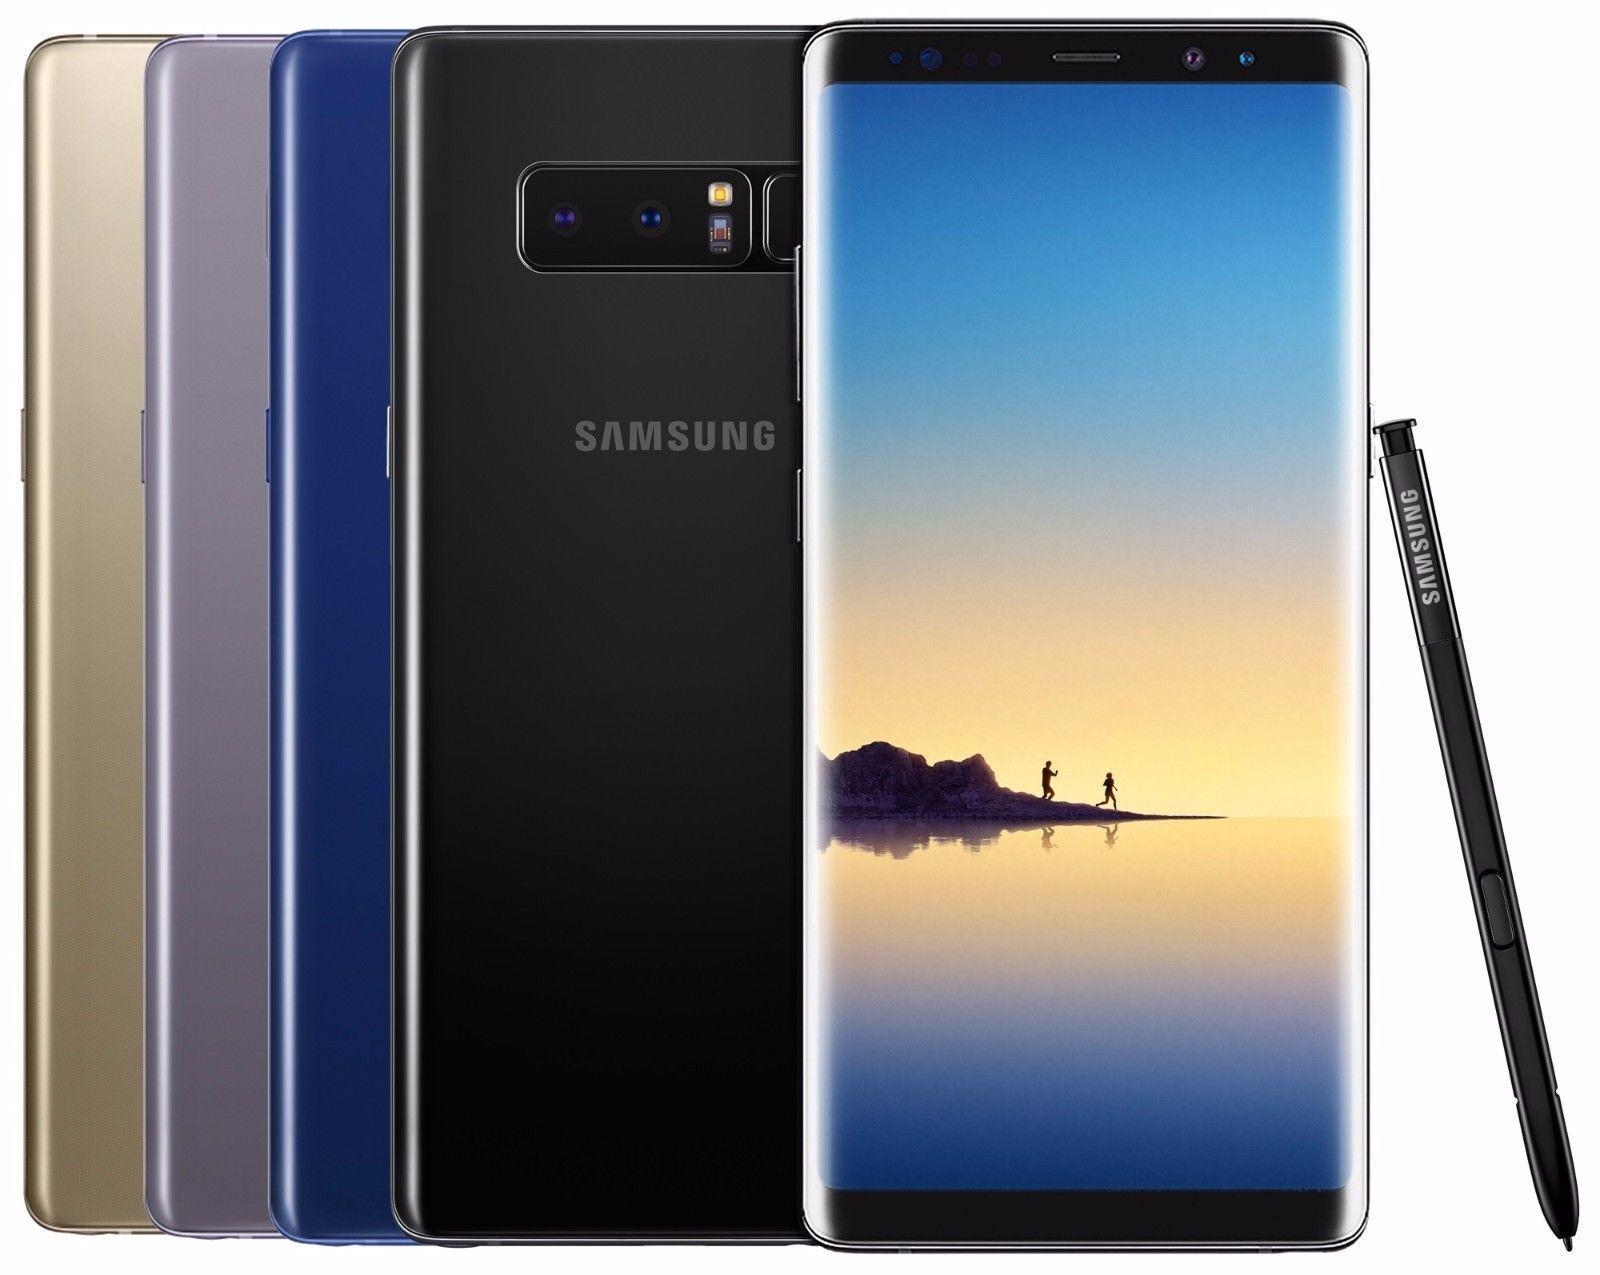 Android Phone - Samsung Galaxy Note 8 N950U 64GB Verizon + GSM Unlocked Smartphone